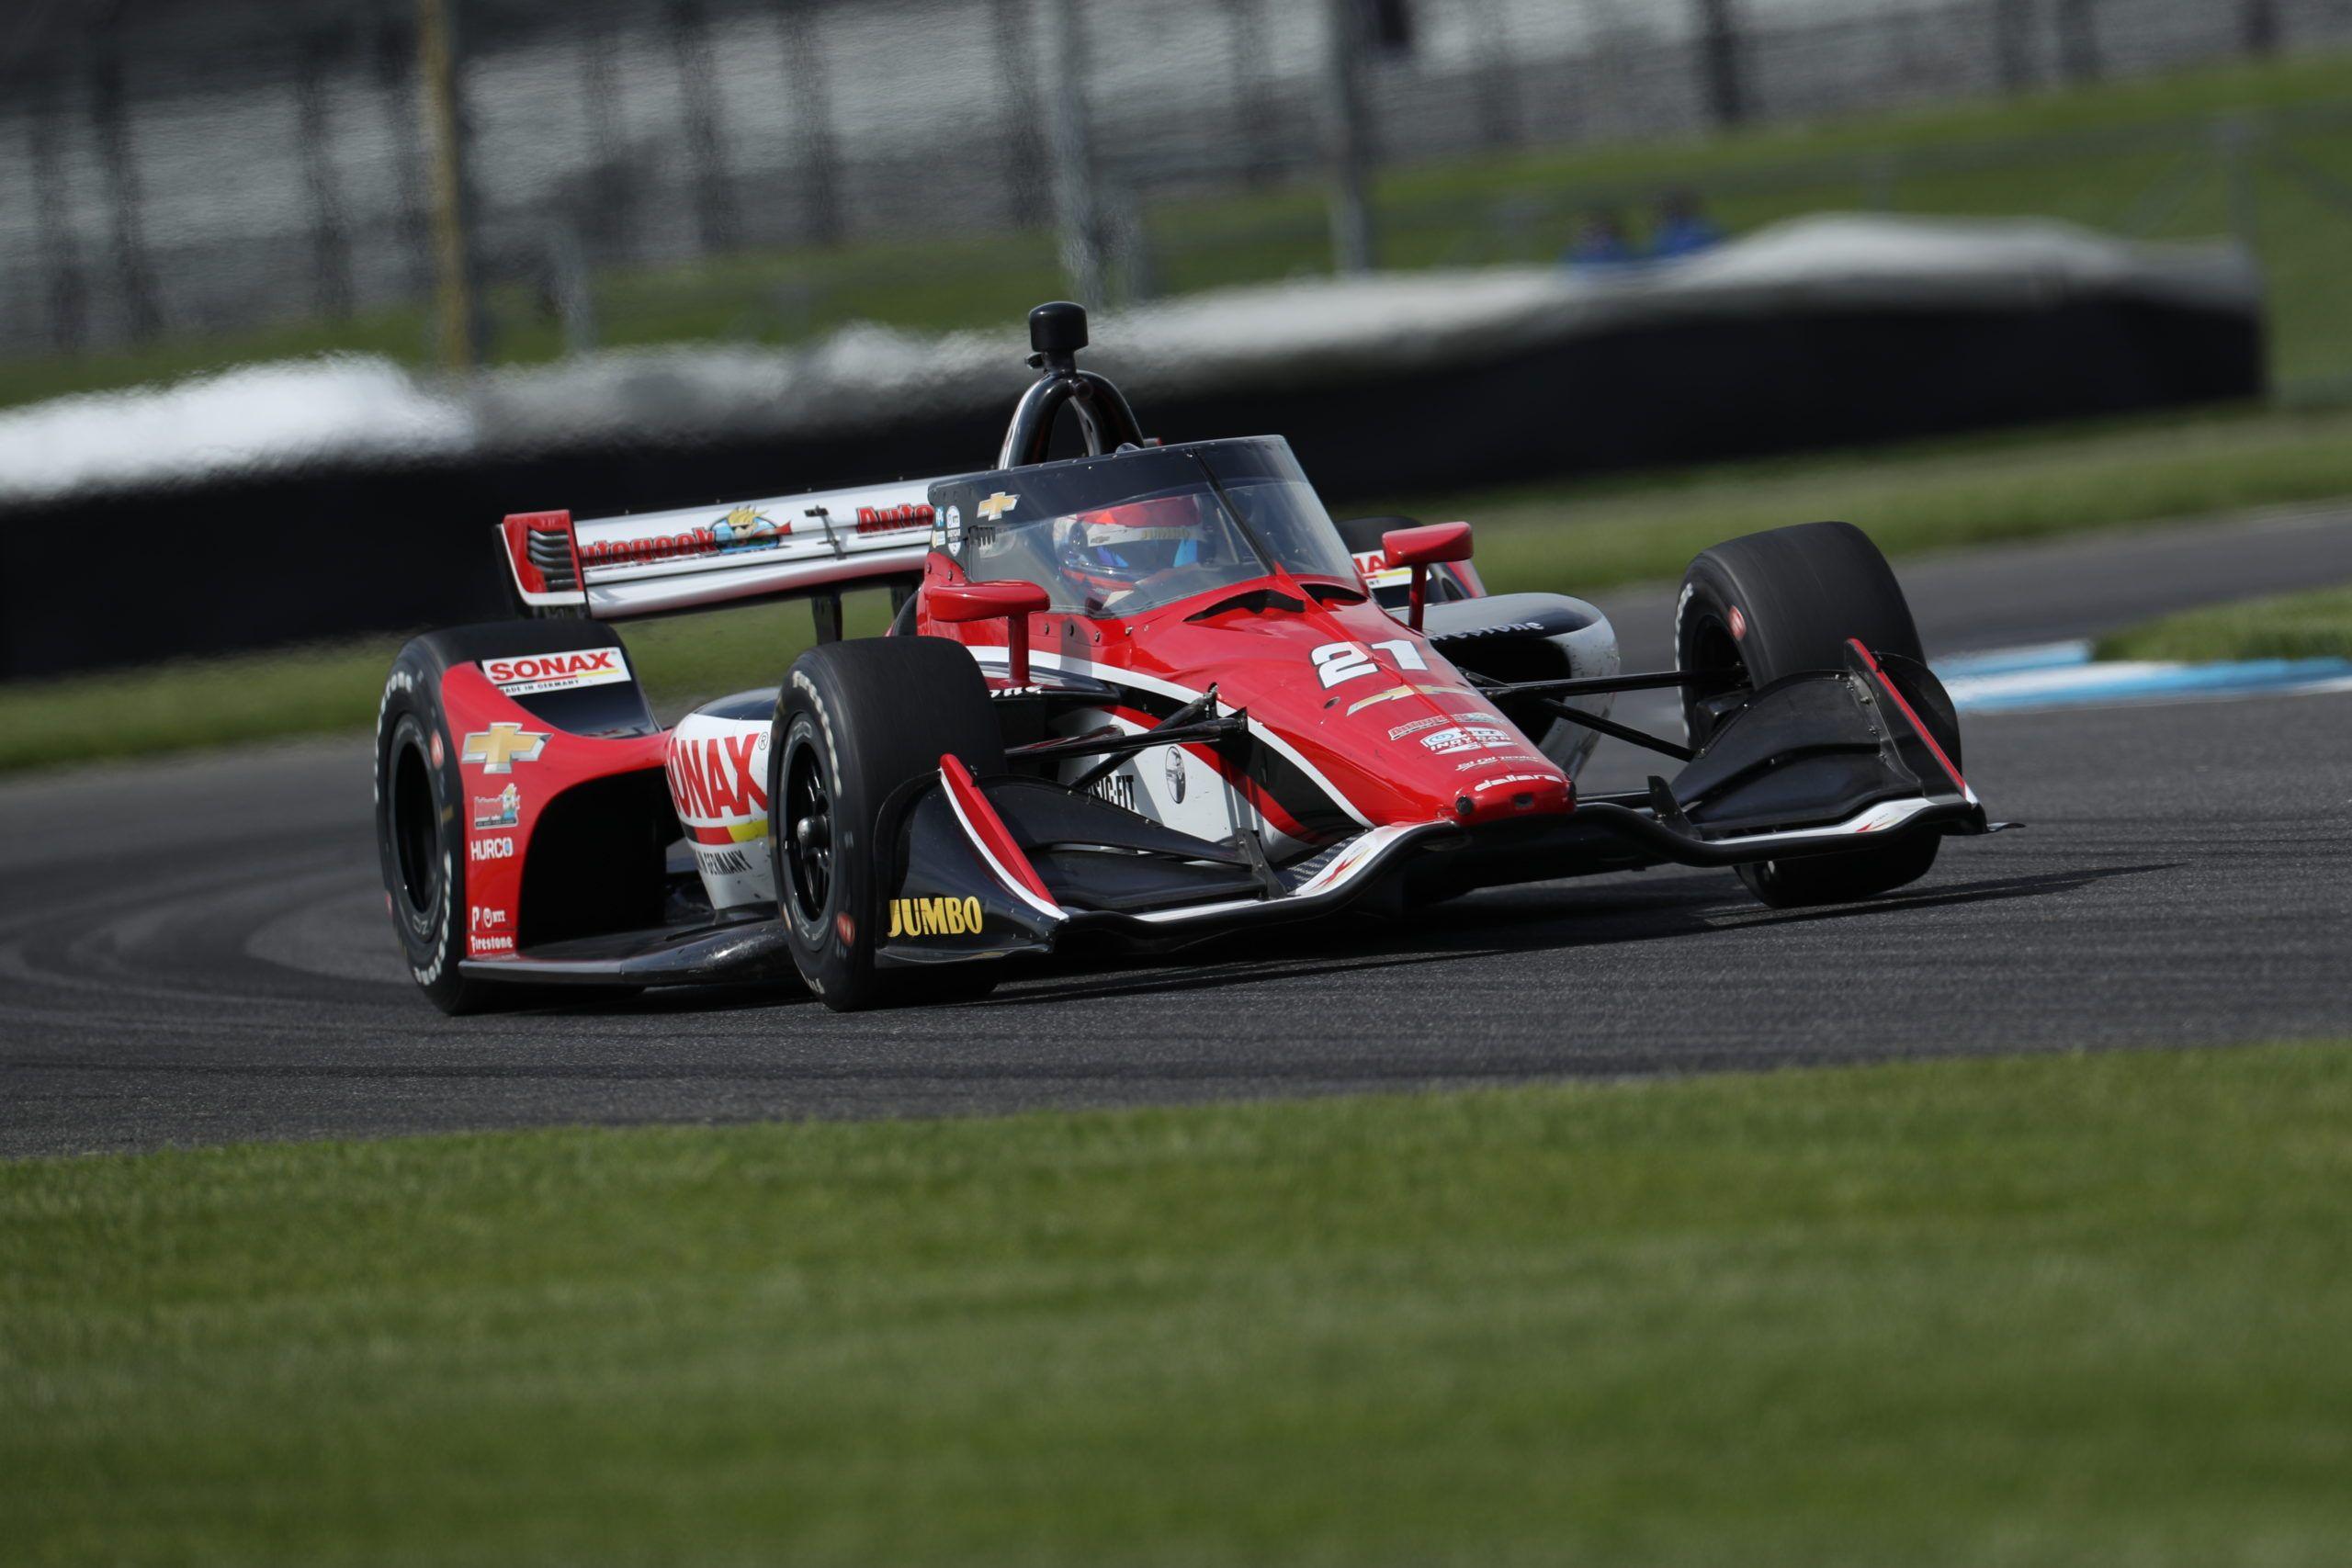 IndyCar, IndyCar 2021, GMR Grand Prix, Rinus Veekay, Ed Carpenter Racing